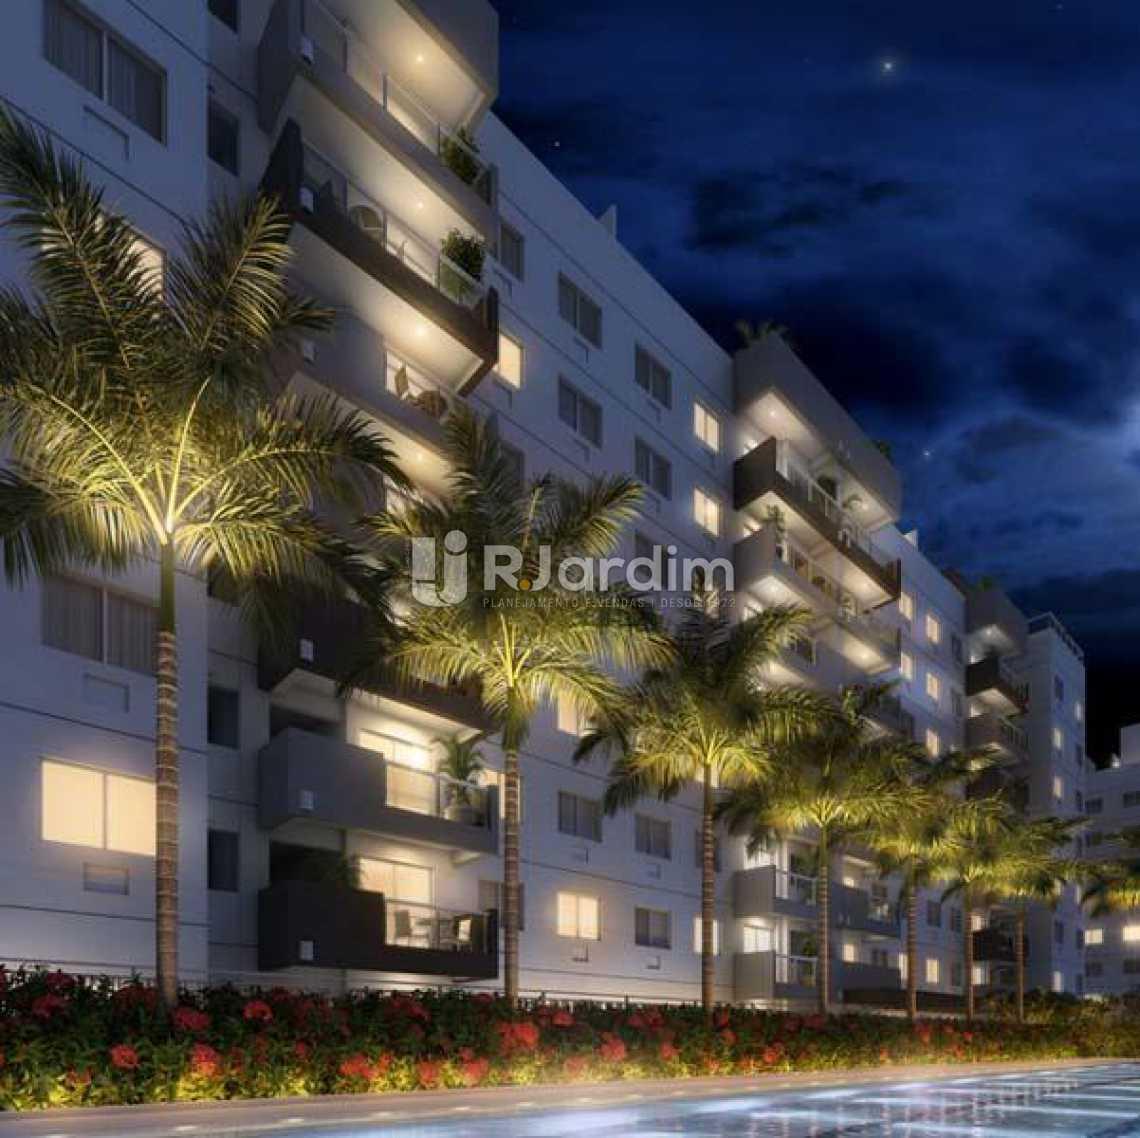 FACHADA NOTURNA - Apartamento À VENDA, Recreio dos Bandeirantes, Rio de Janeiro, RJ - LAAP31478 - 5